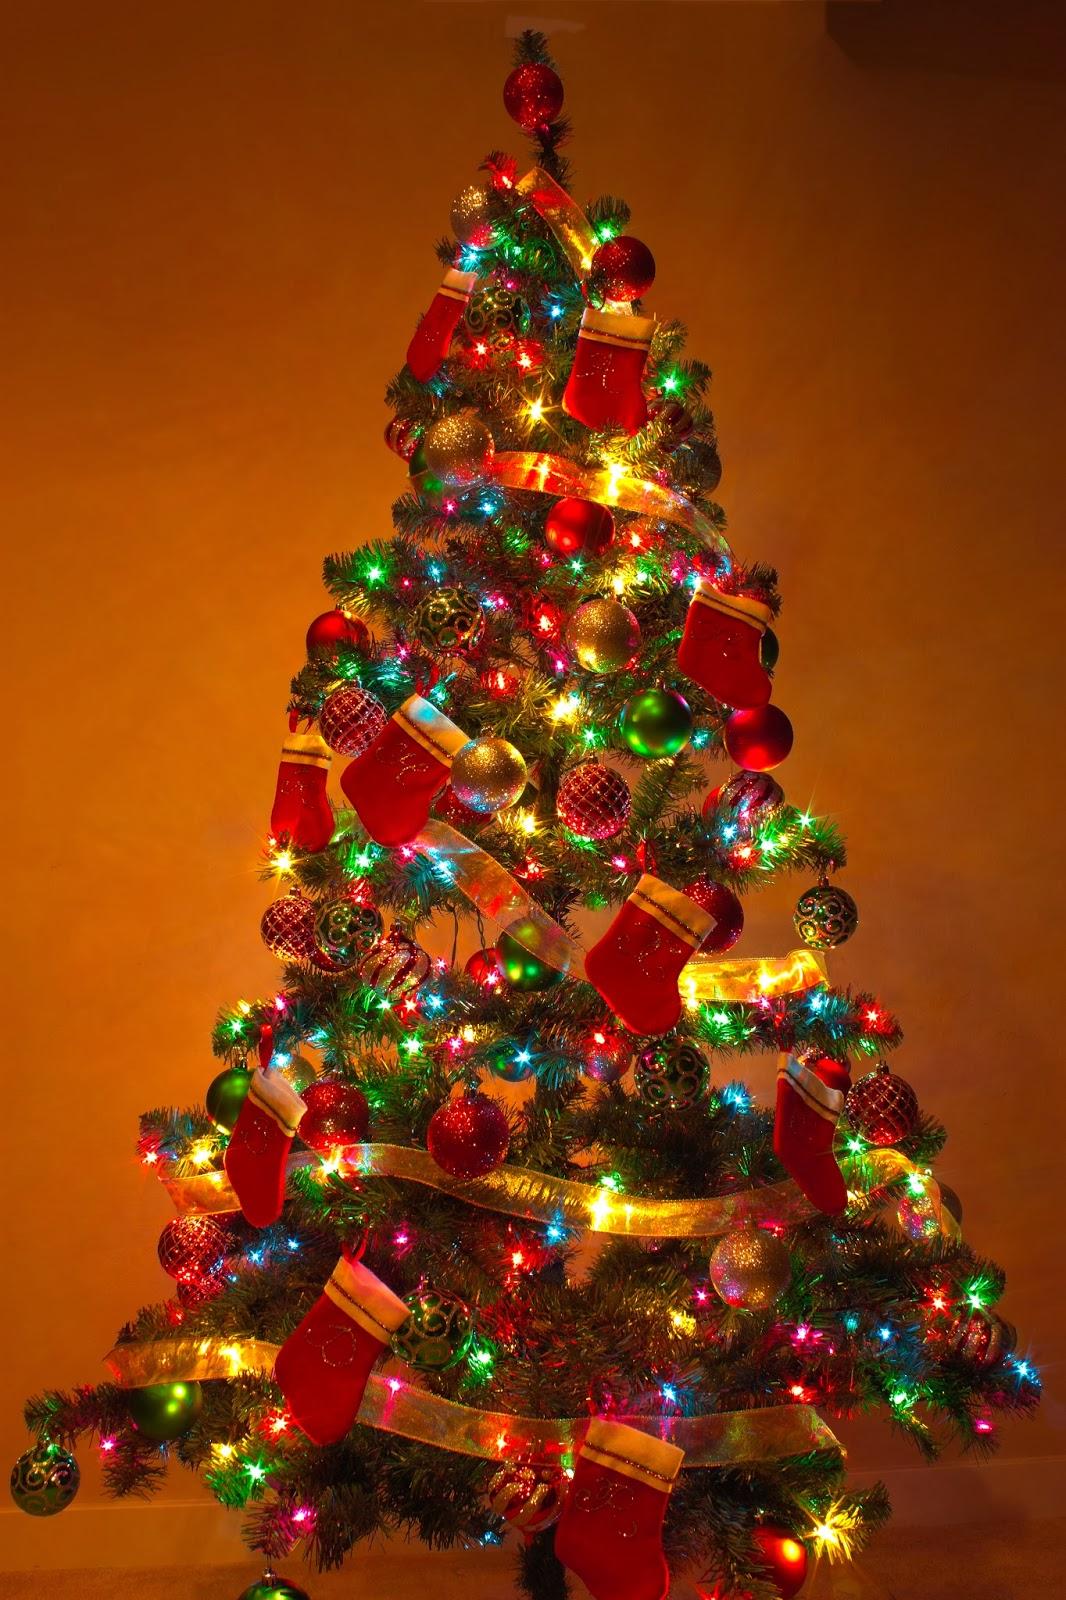 CHRISTMAS TREES CHRISTMAS TREE DECORATIONS - happy ...